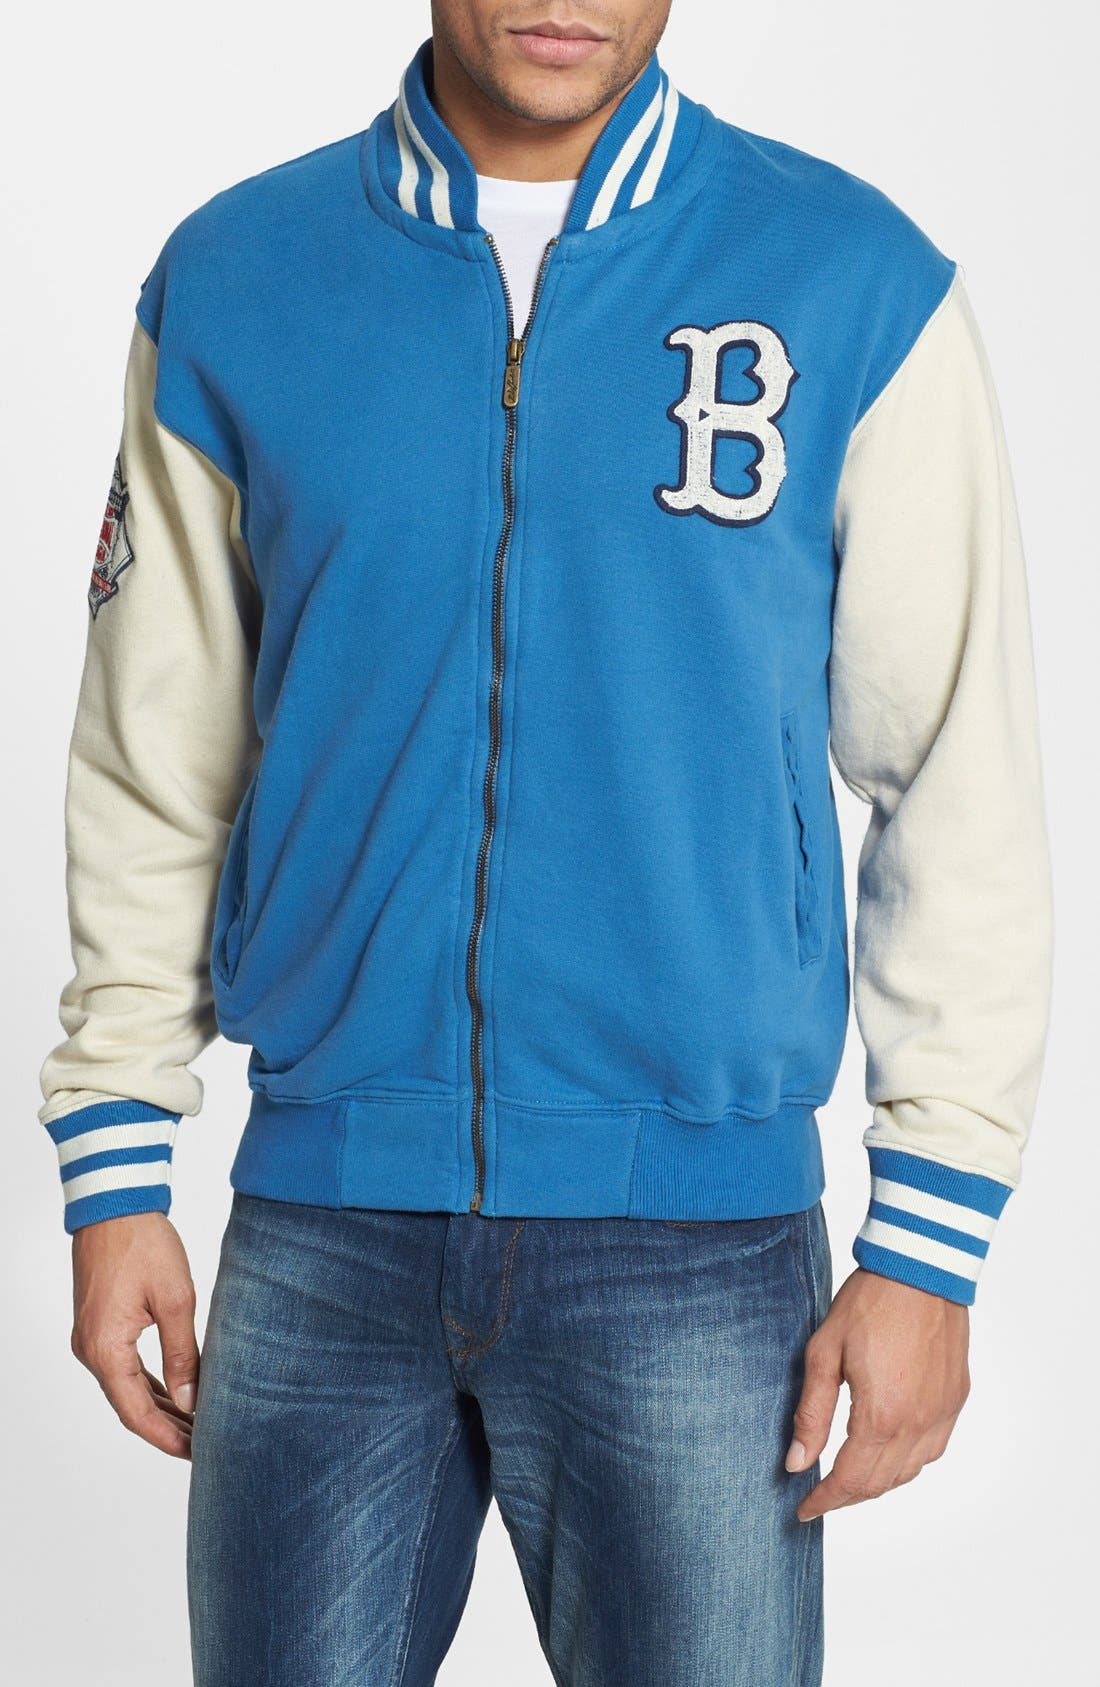 Alternate Image 1 Selected - American Needle 'Brooklyn Dodgers' Varsity Jacket